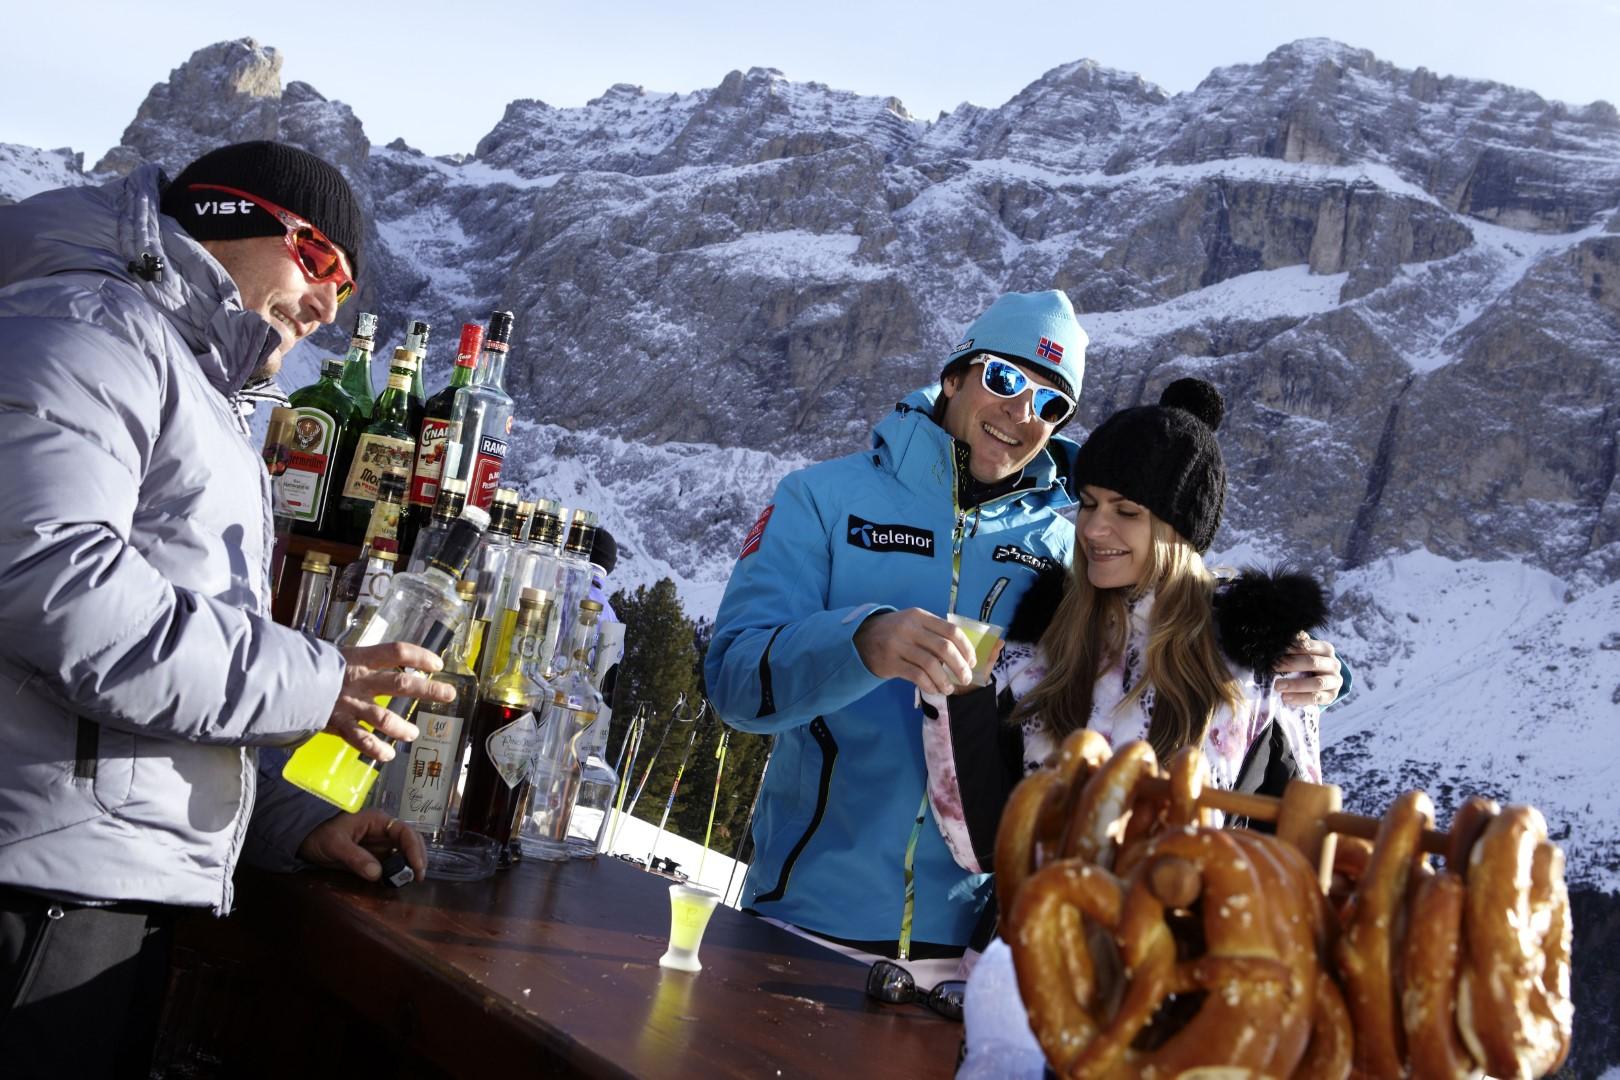 2011 Piz Seteur 030 - Апре-Ски